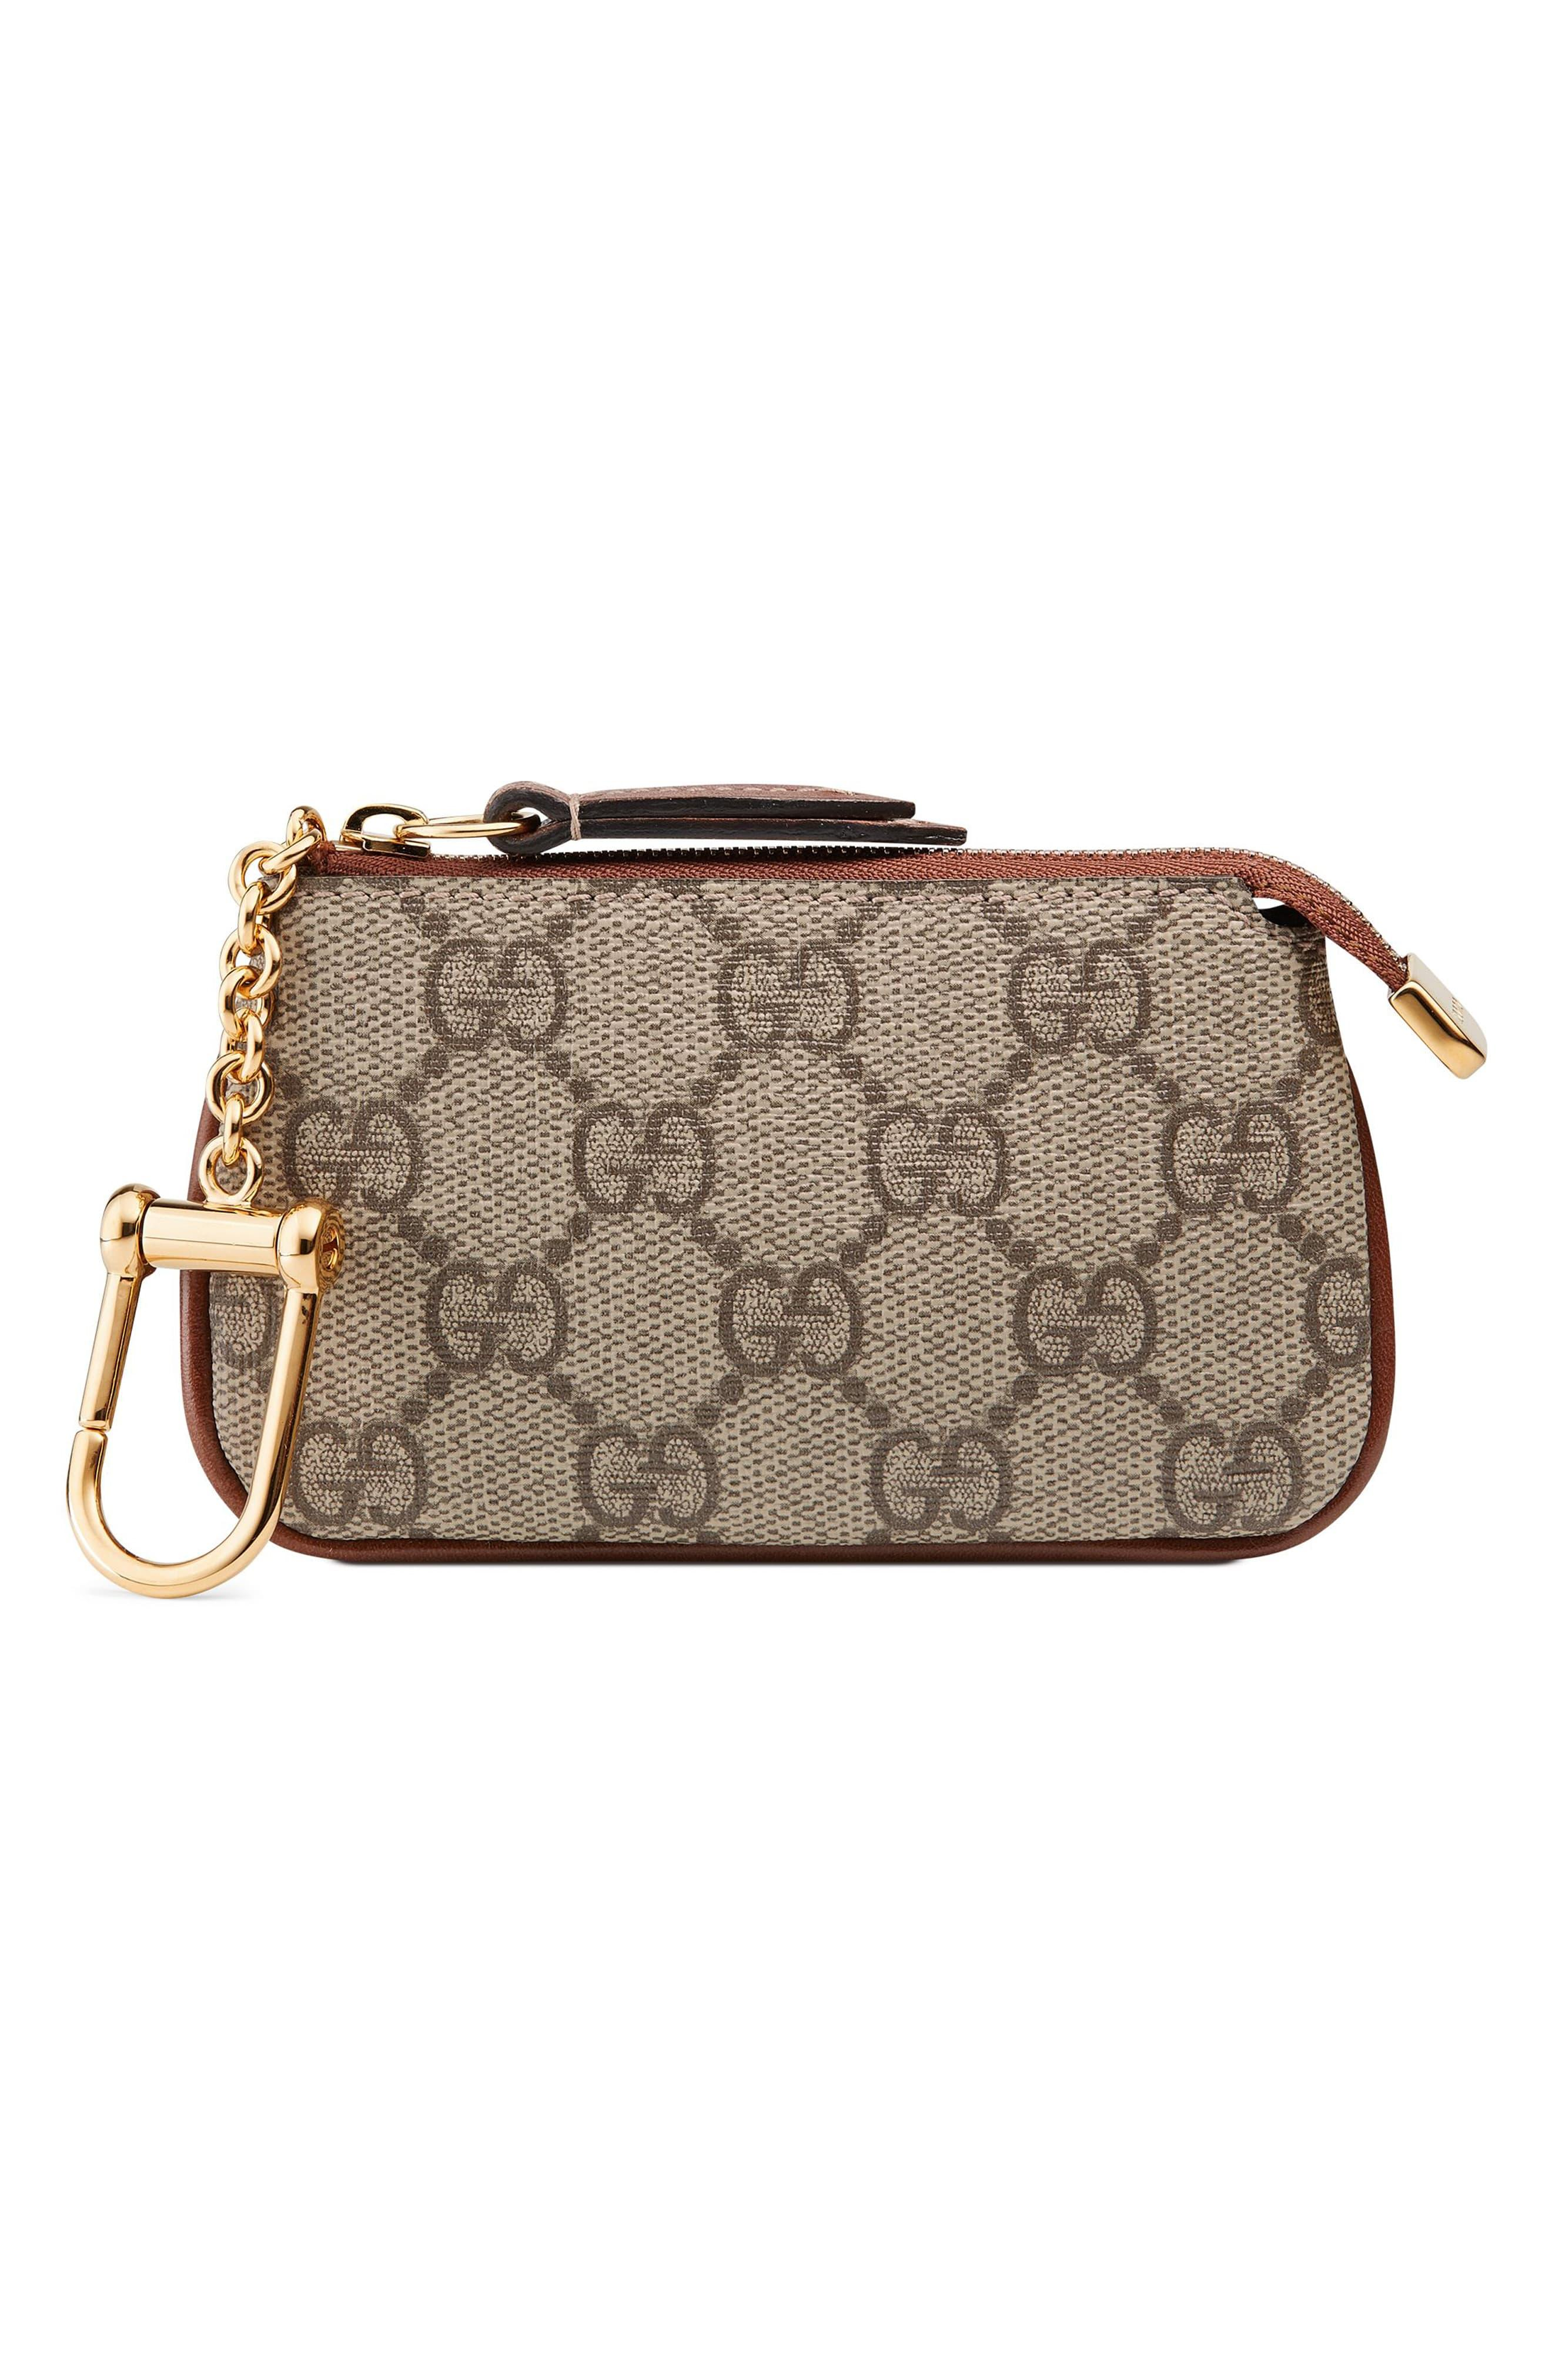 beab9b0dadde Gucci Linea Gg Supreme Canvas Key Case Pouch - - Lyst